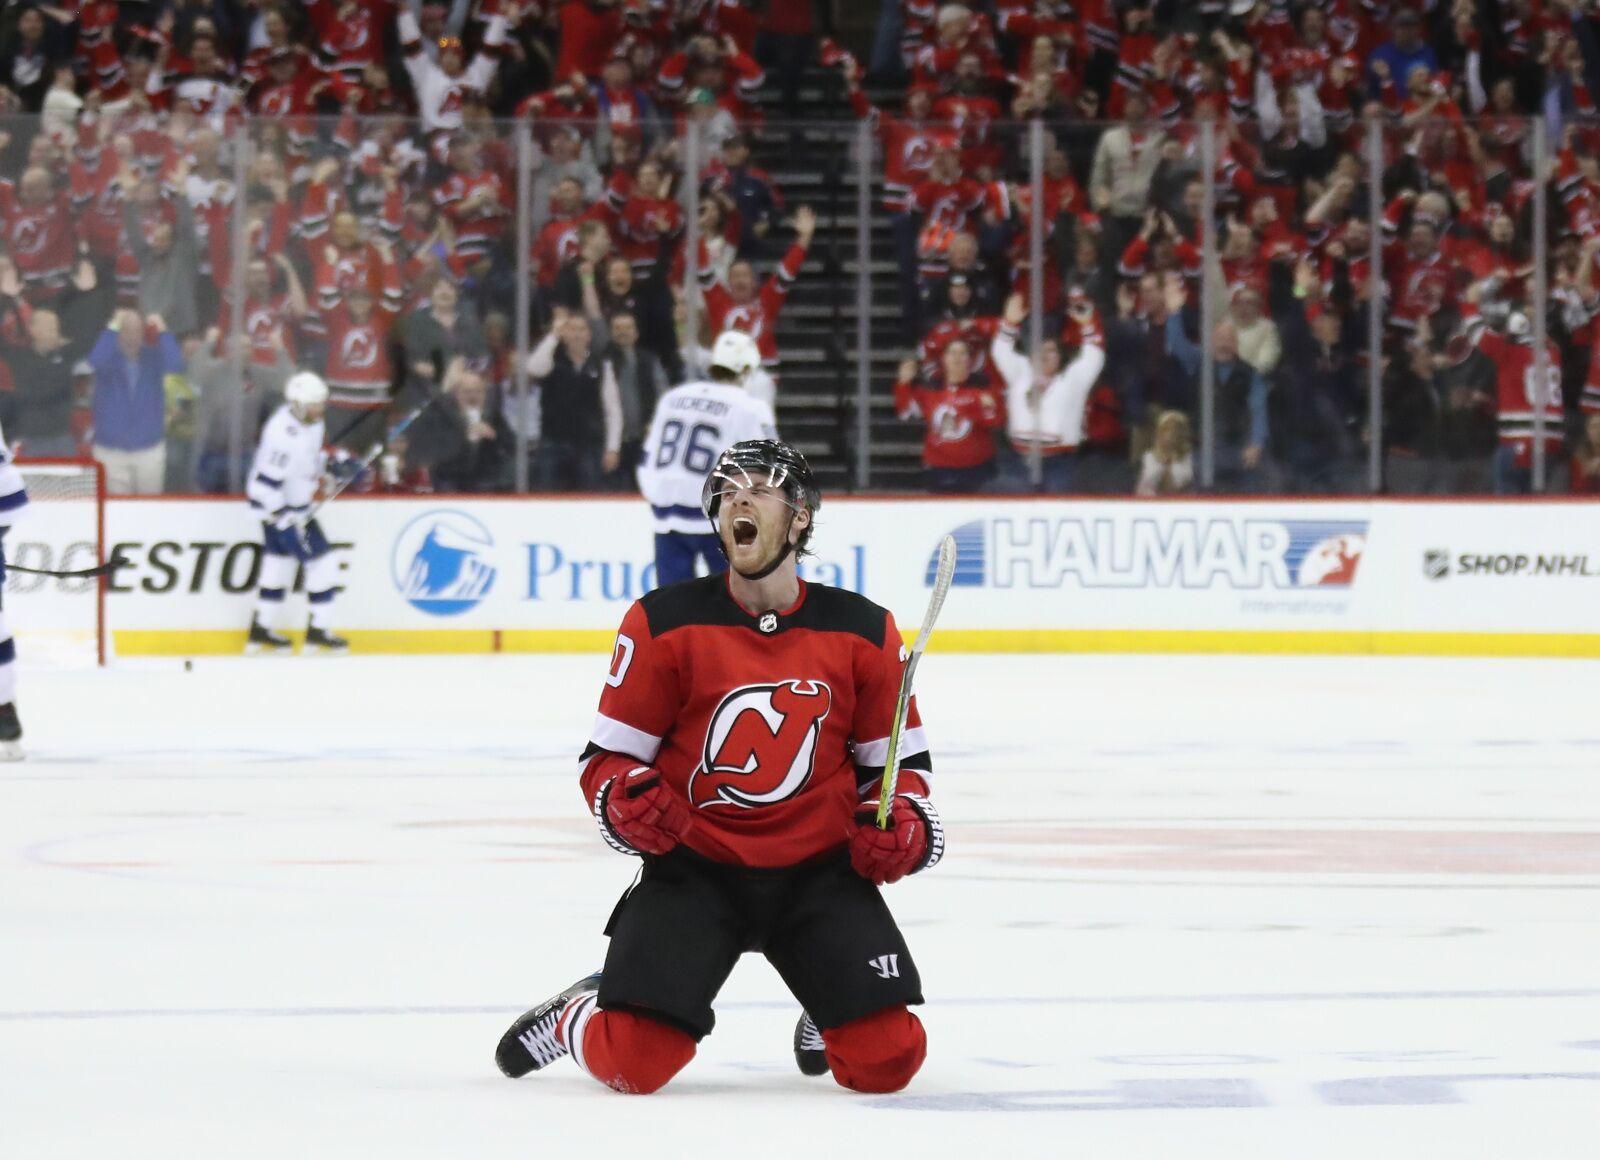 reputable site 6fce0 20082 New Jersey Devils: Analyzing Blake Coleman's Worth